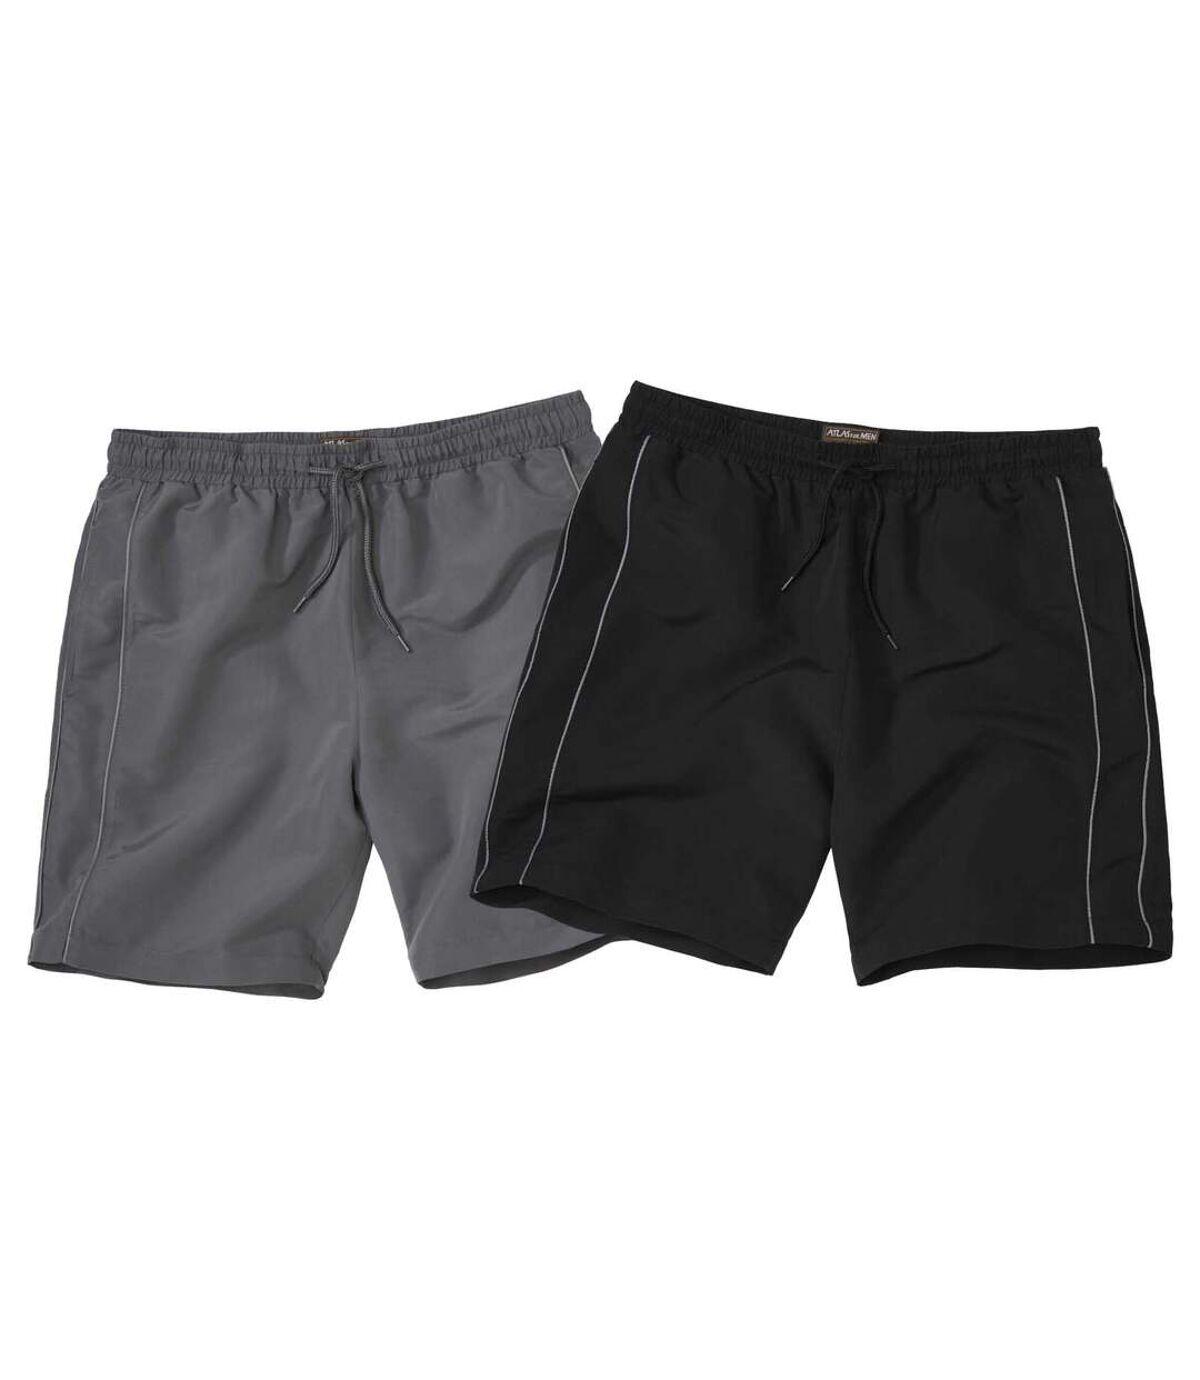 Sada 2 sportovních šortek Beach Sport Atlas For Men